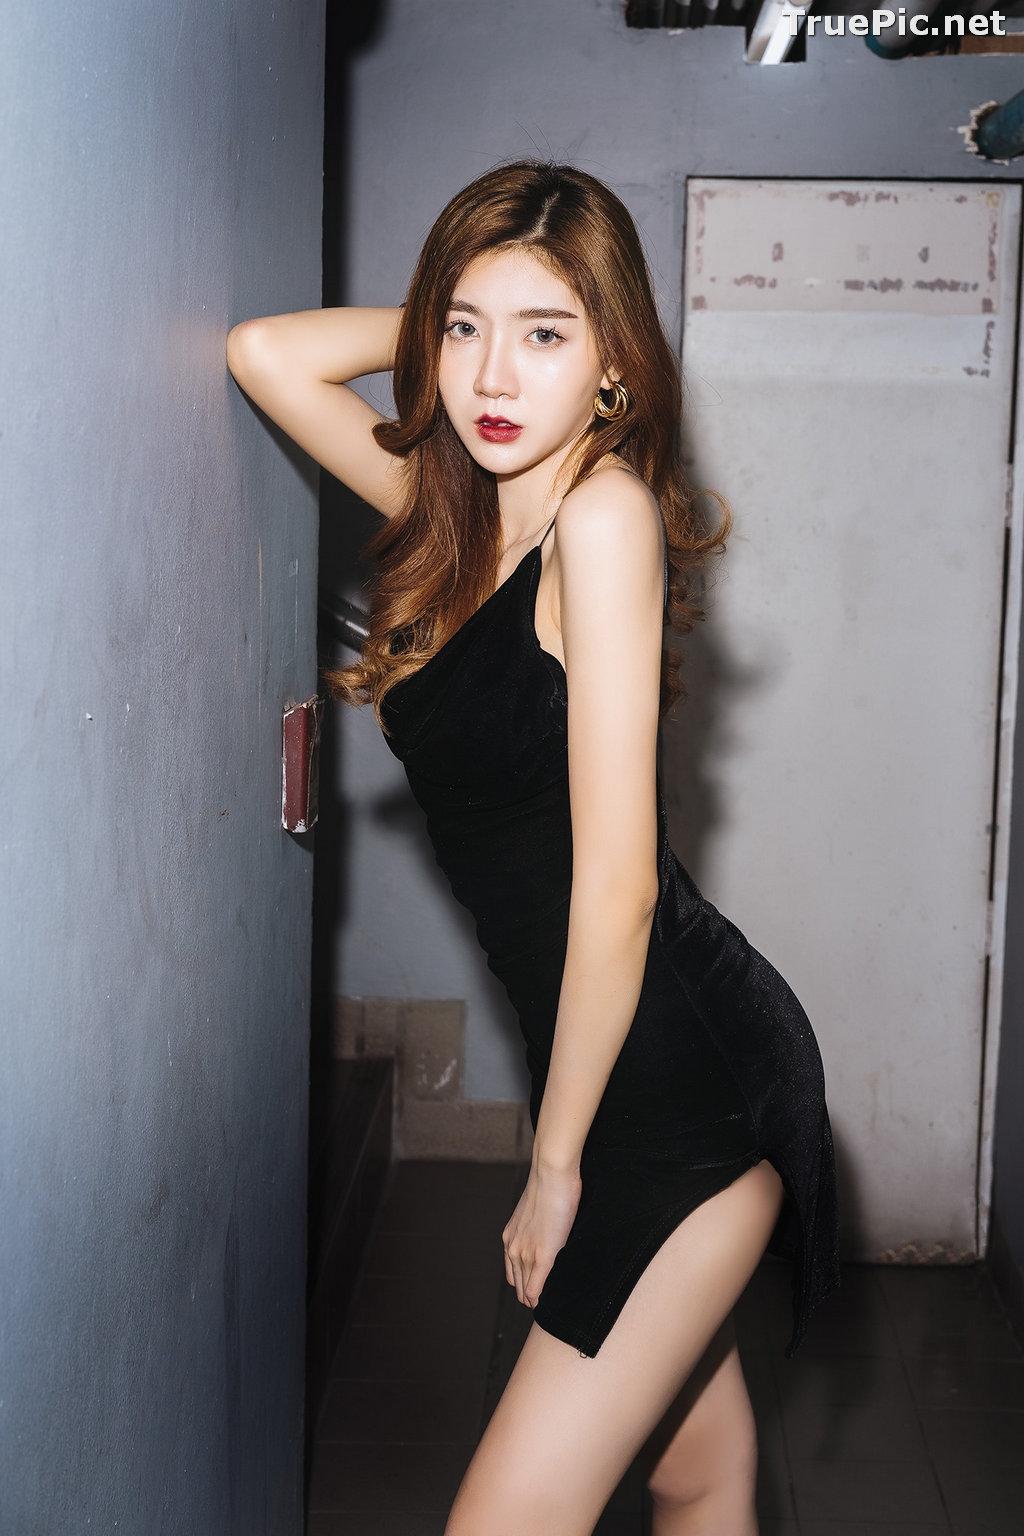 Image Thailand Model - Sasi Ngiunwan - Black For SiamNight - TruePic.net - Picture-23